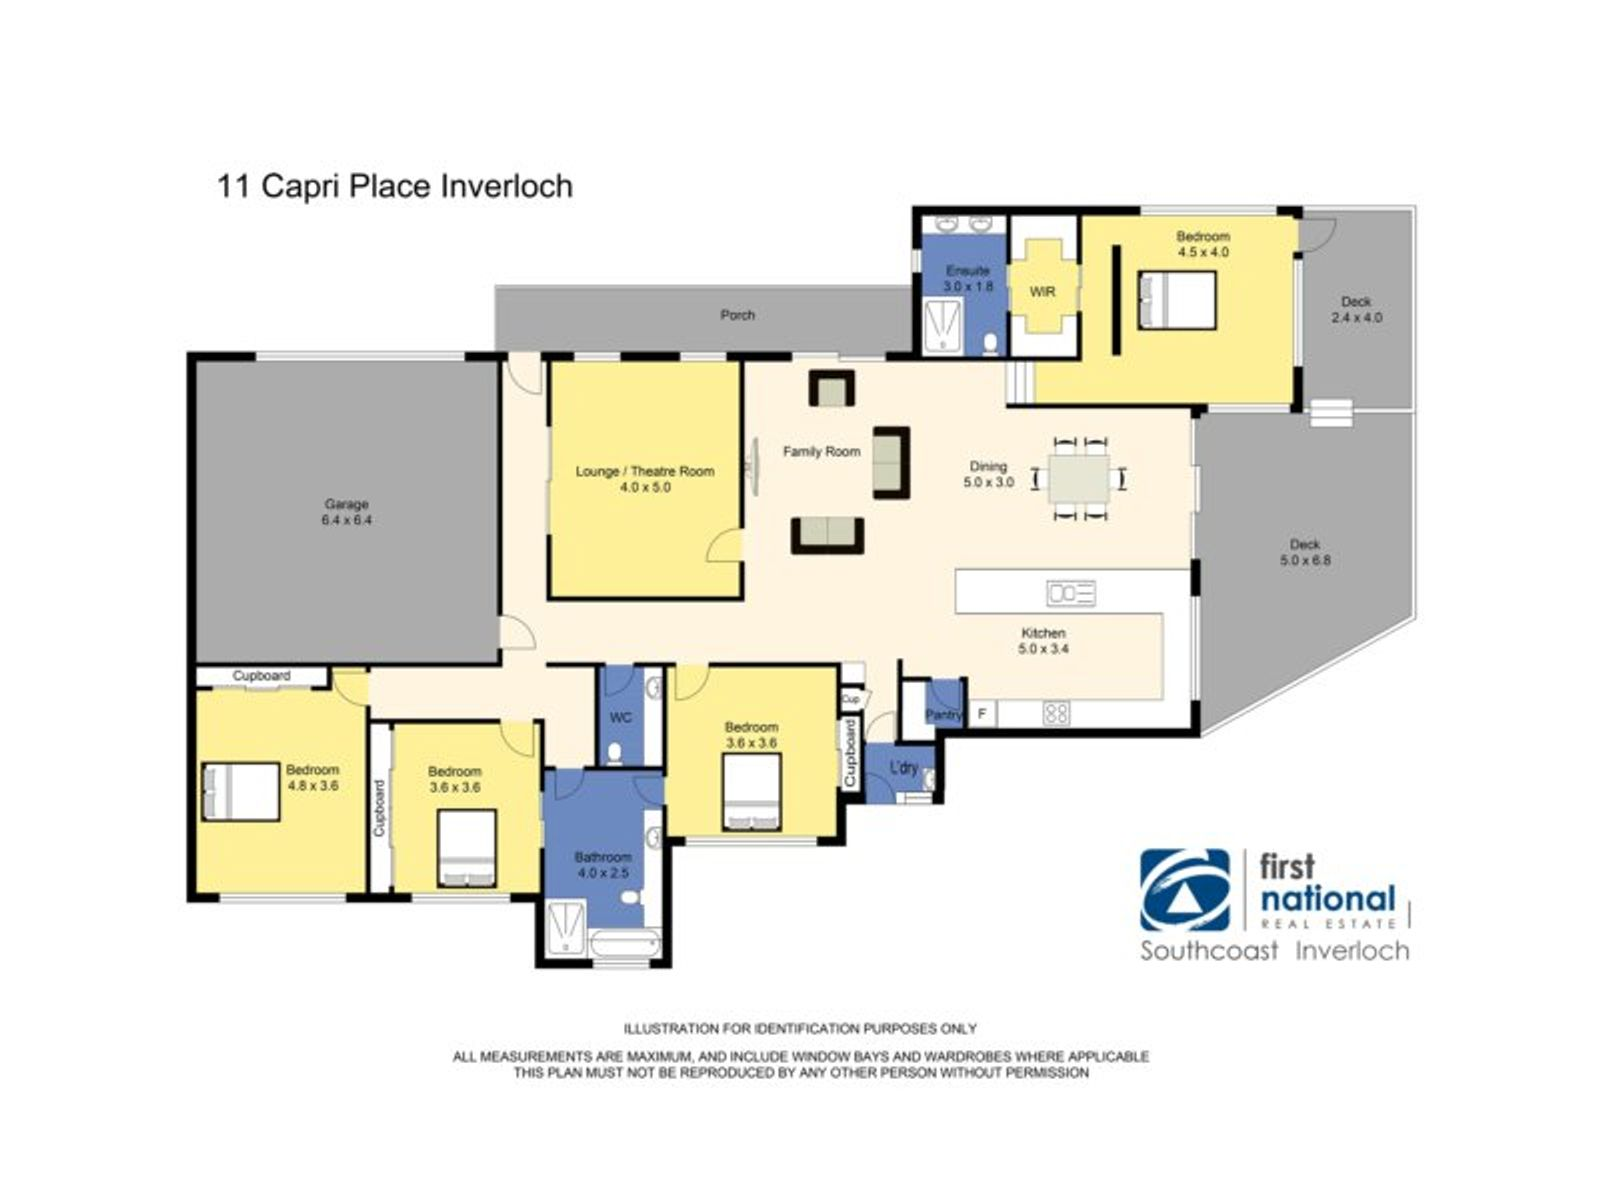 11 Capri Place, Inverloch, VIC 3996